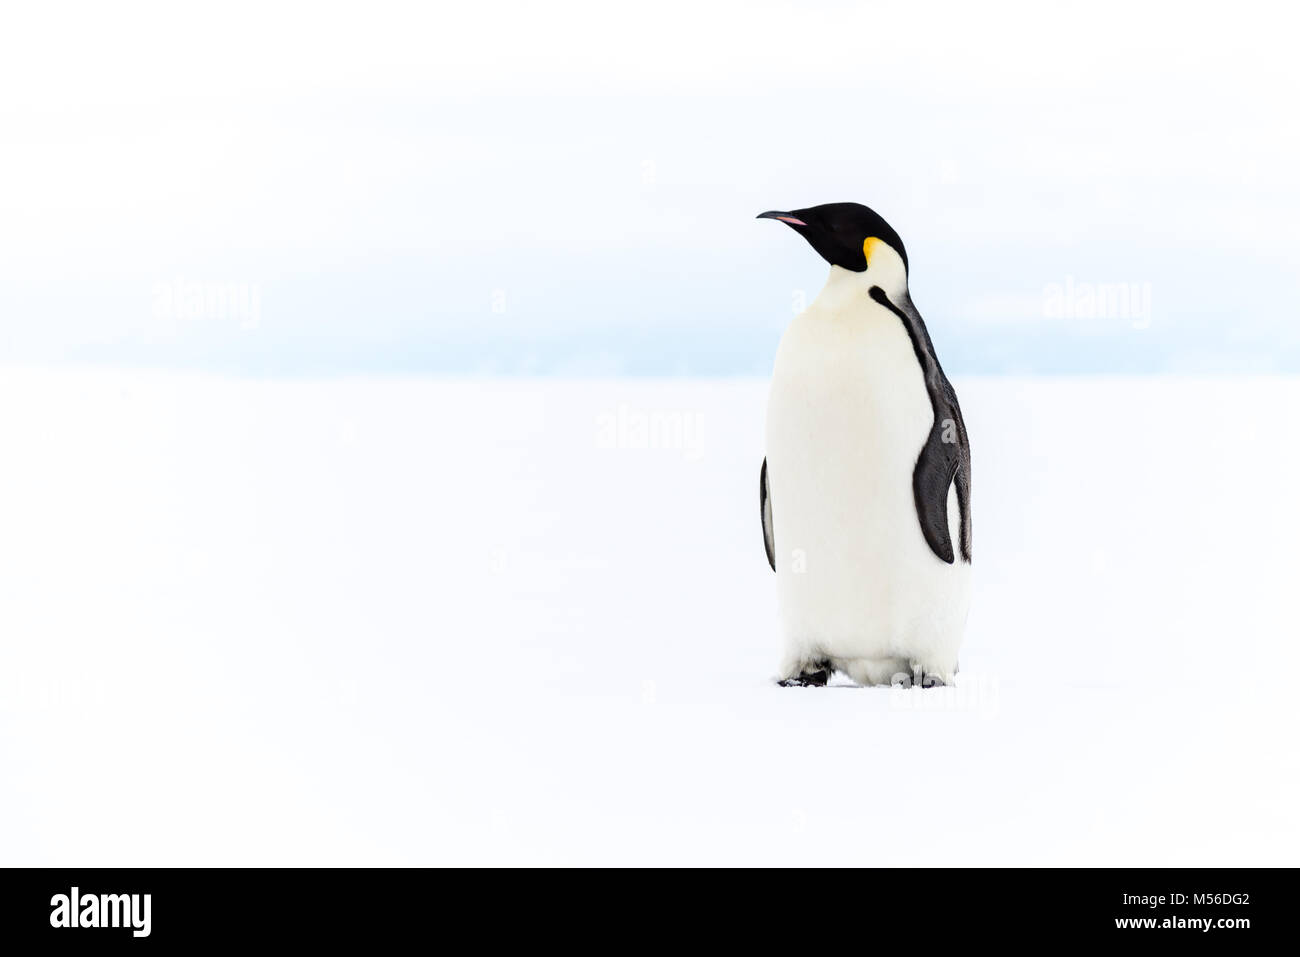 Pinguino imperatore, Ross Ice Shelf, Antartide Immagini Stock